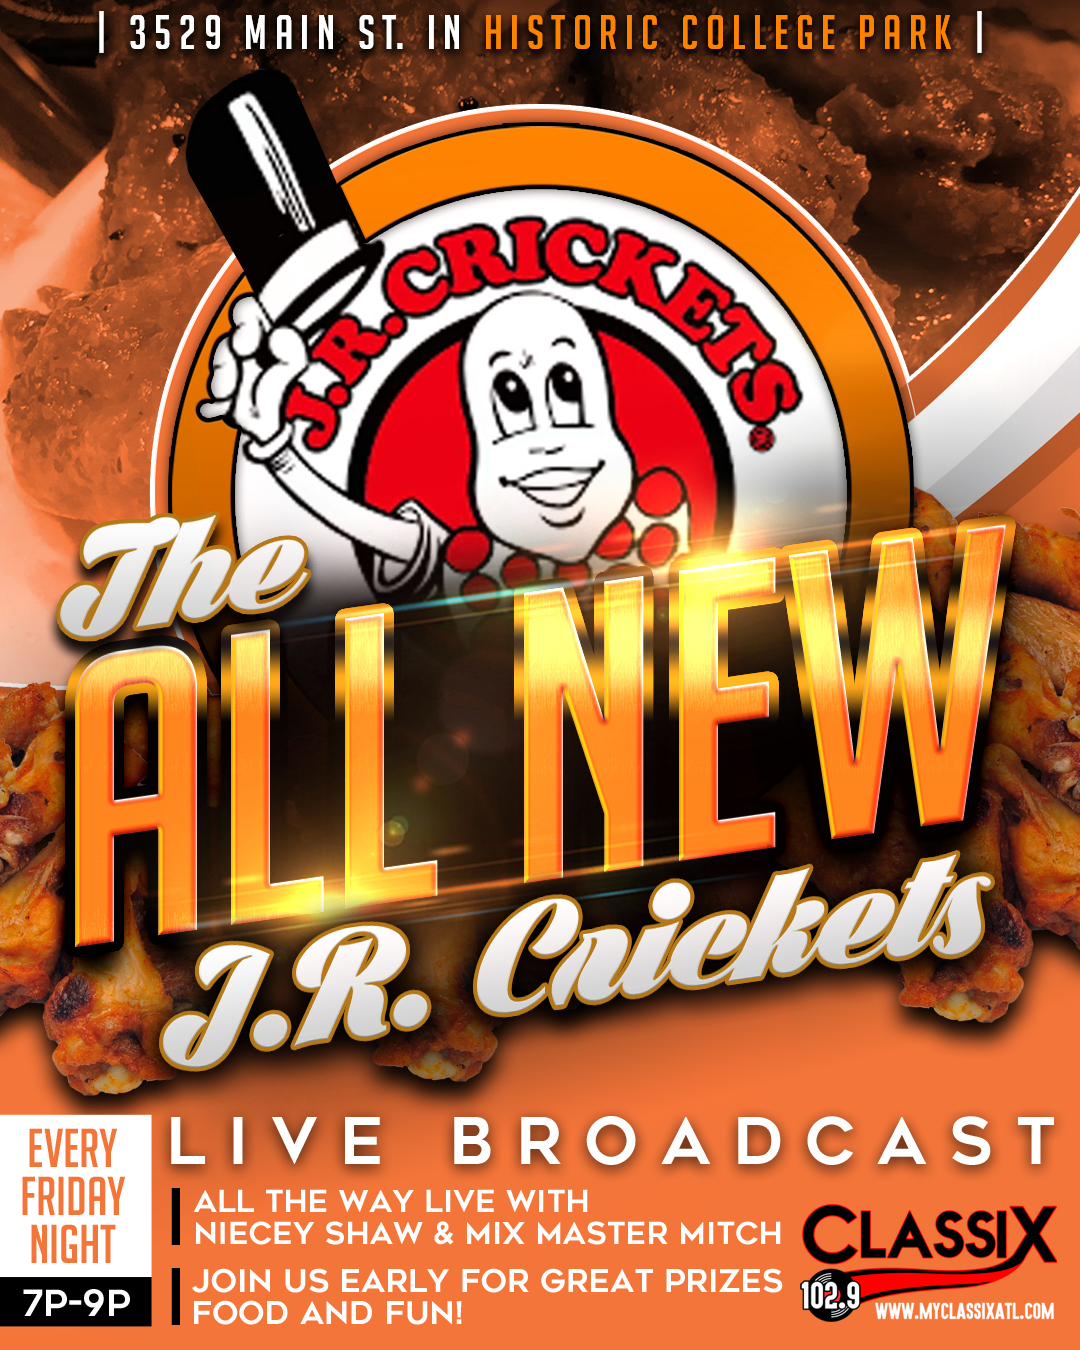 JR Crickets Live Broadcast